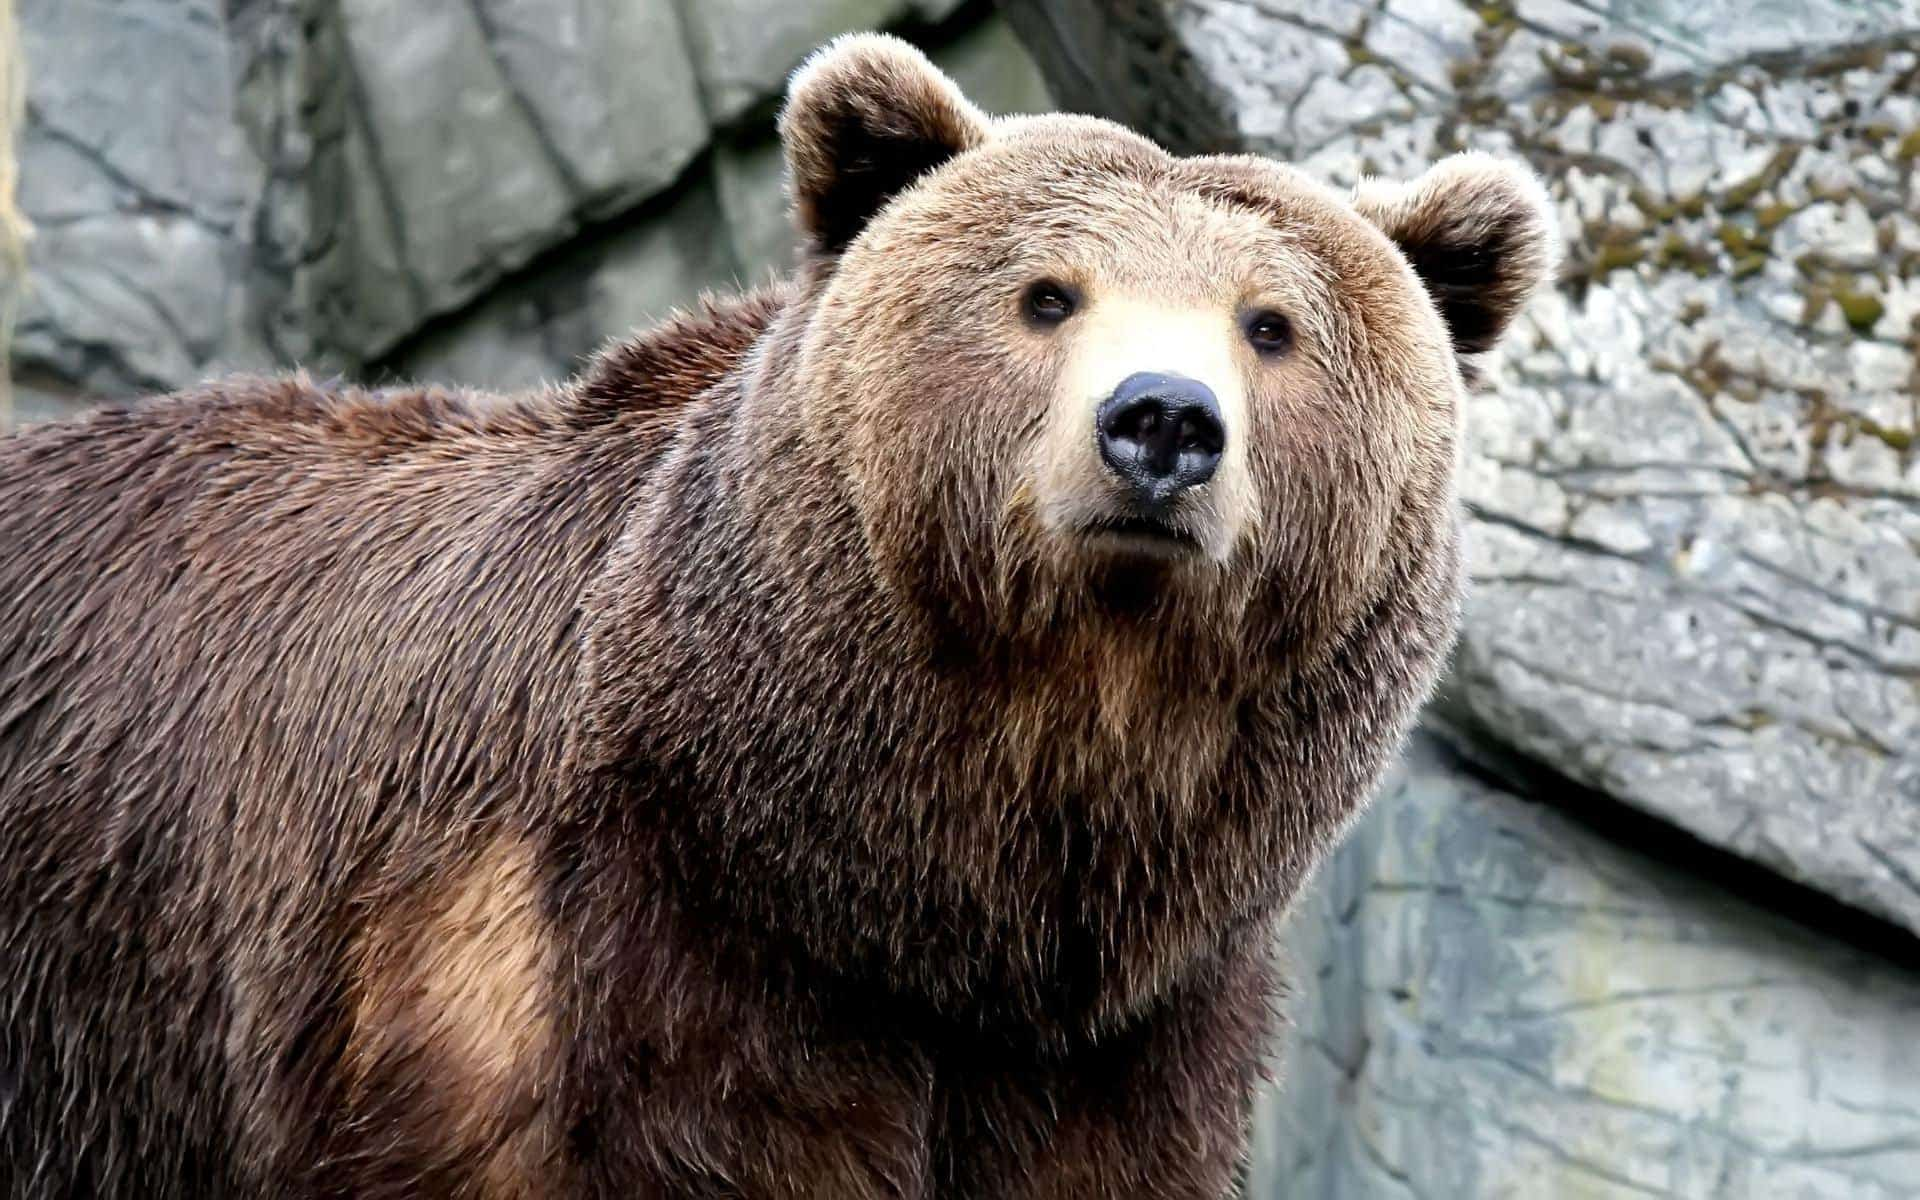 bear dream meaning, dream about bear, bear dream interpretation, seeing in a dream bear